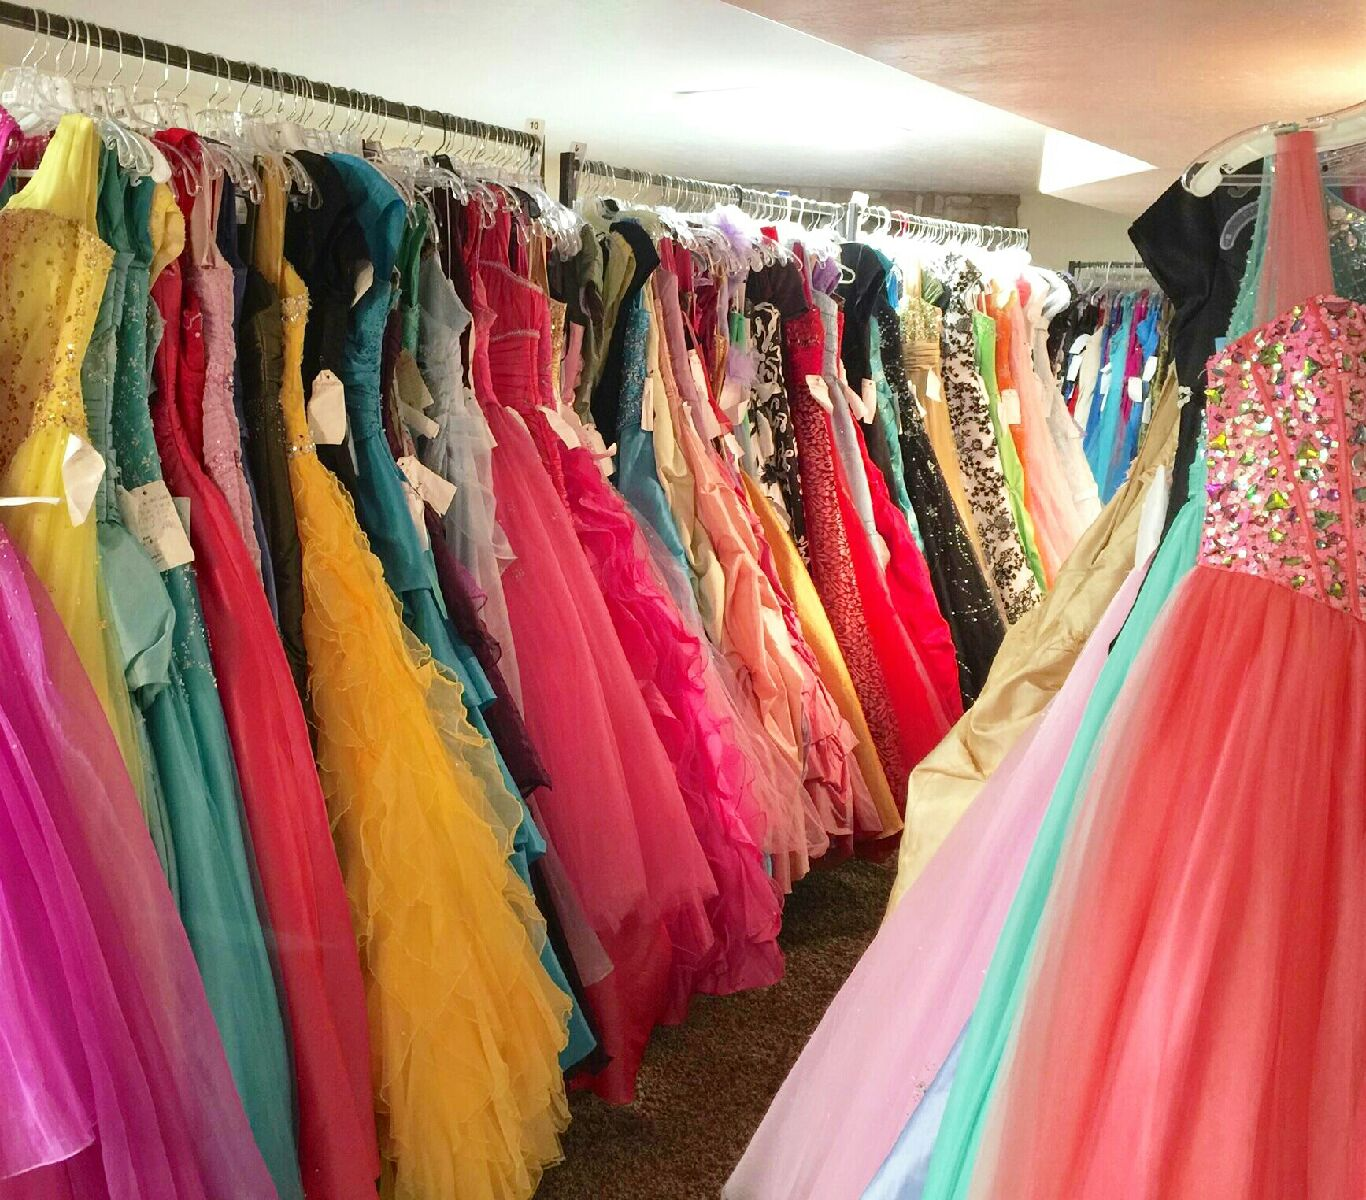 The dress garden - Dresses In Shop 2 Dresses In Shop 1